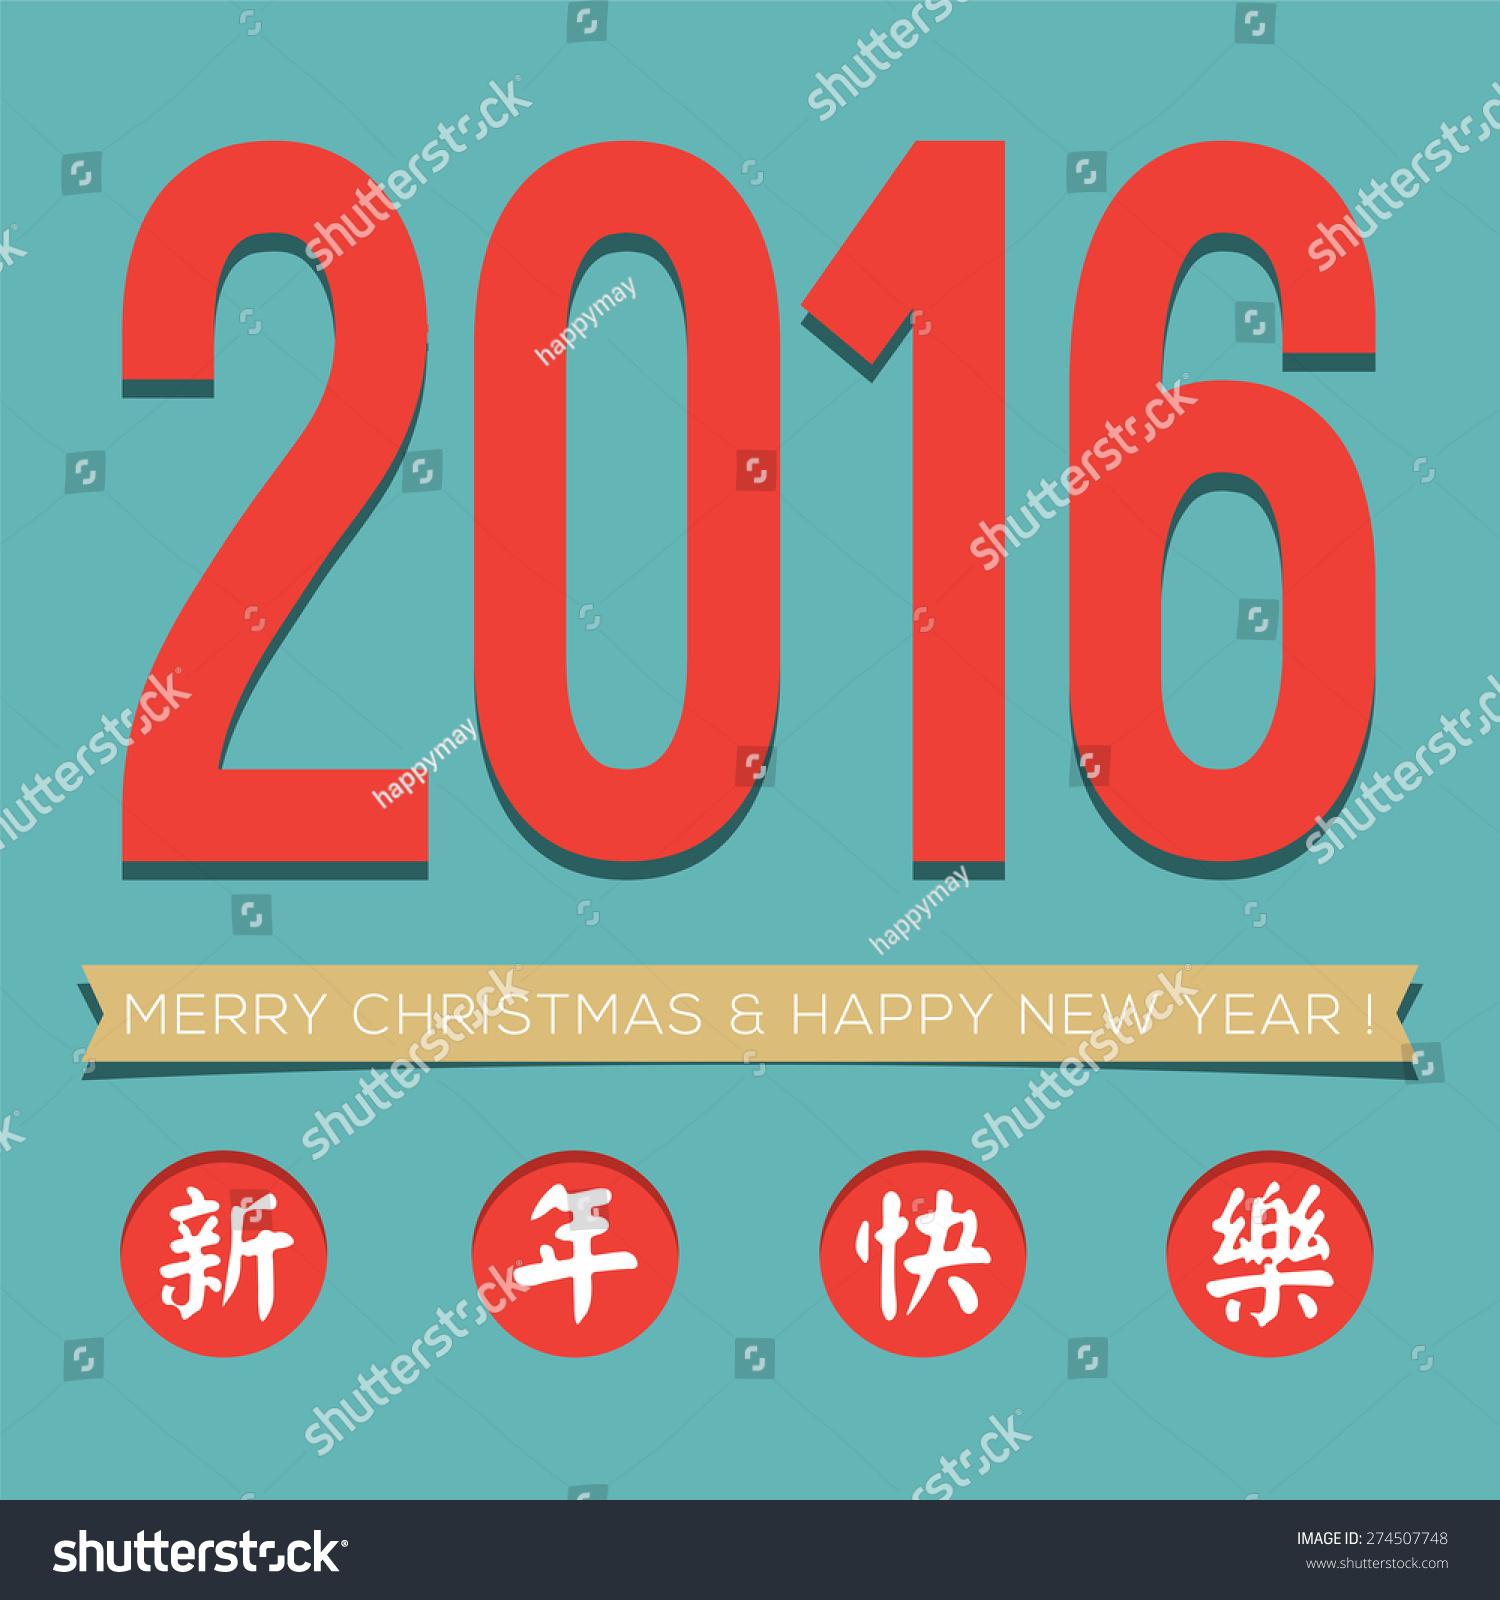 Xin nian kuai le greetings image collections greeting card examples 2016 greeting card traditional chinese alphabets stock vector 2016 greeting card with traditional chinese alphabets xin kristyandbryce Choice Image